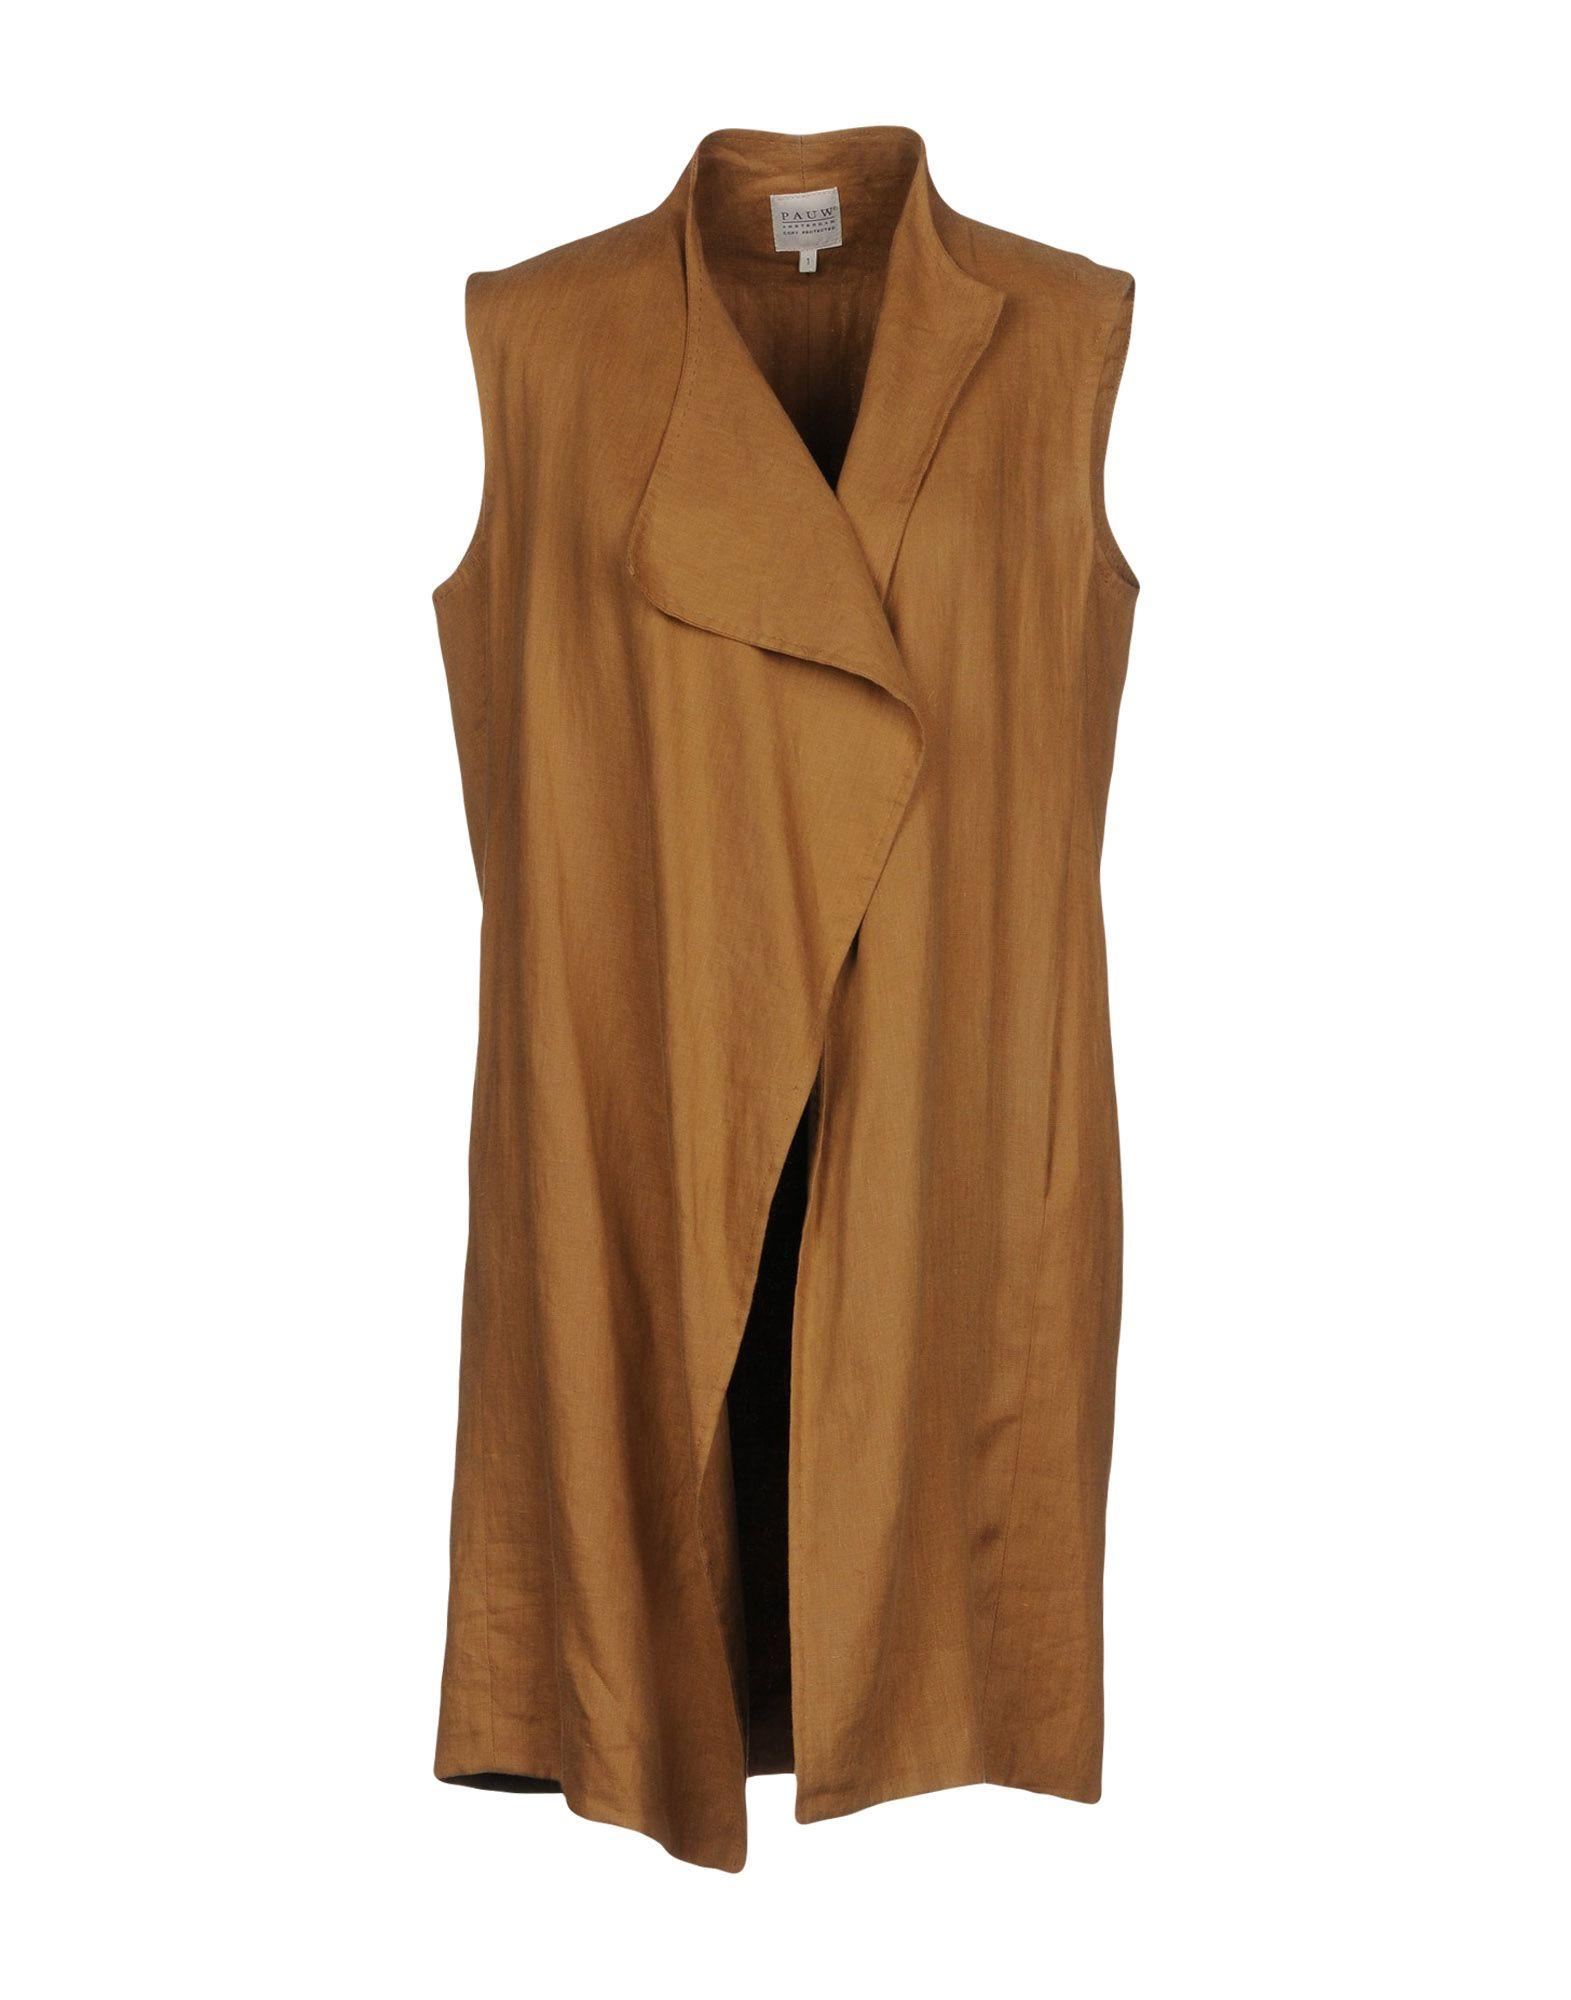 PAUW Full-Length Jacket in Camel